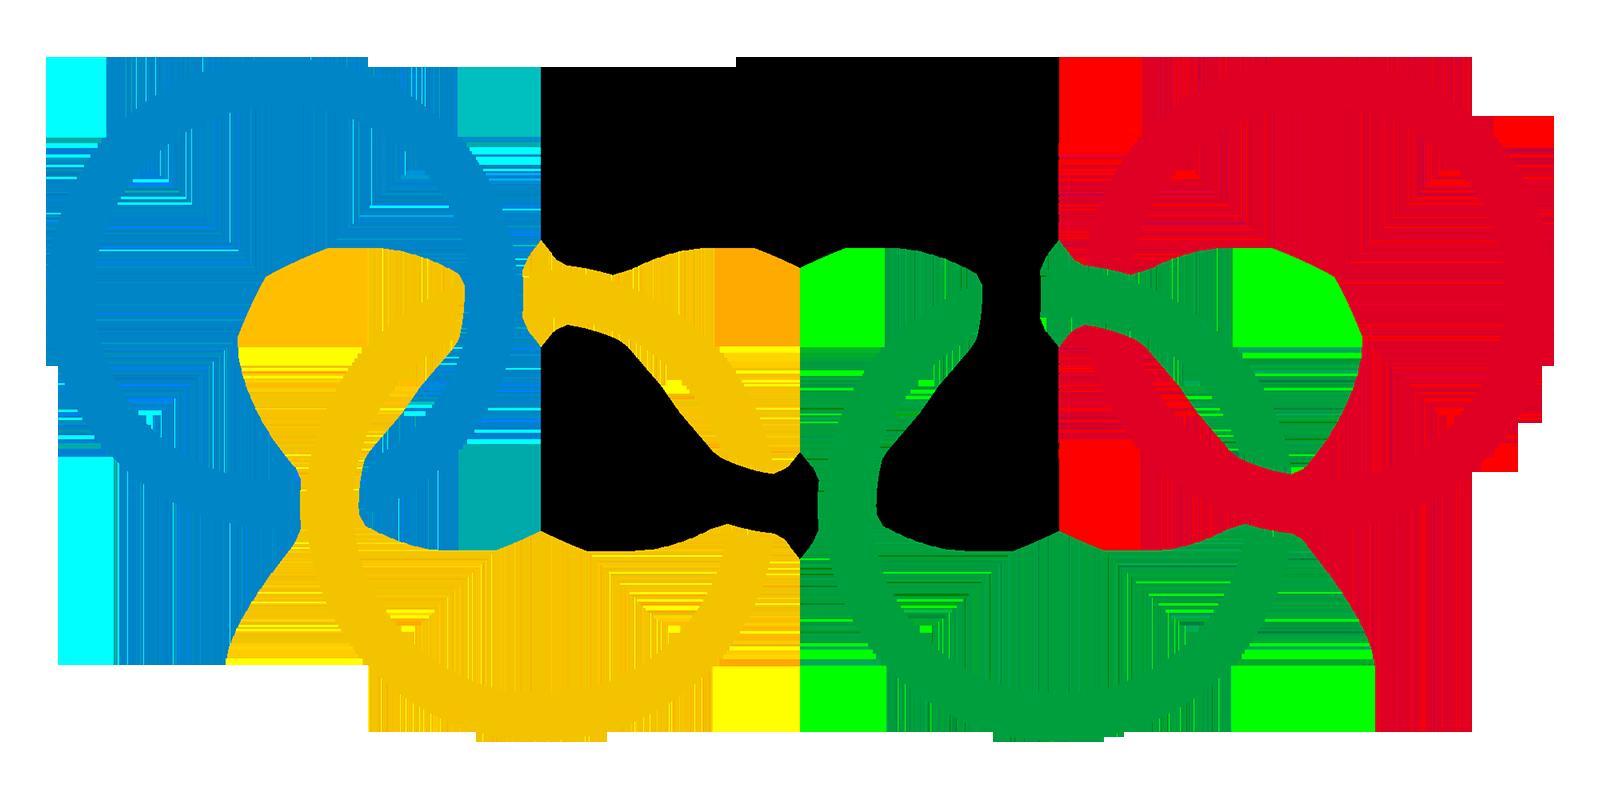 Olympics Logo Olympics Symbol Meaning History And Evolution